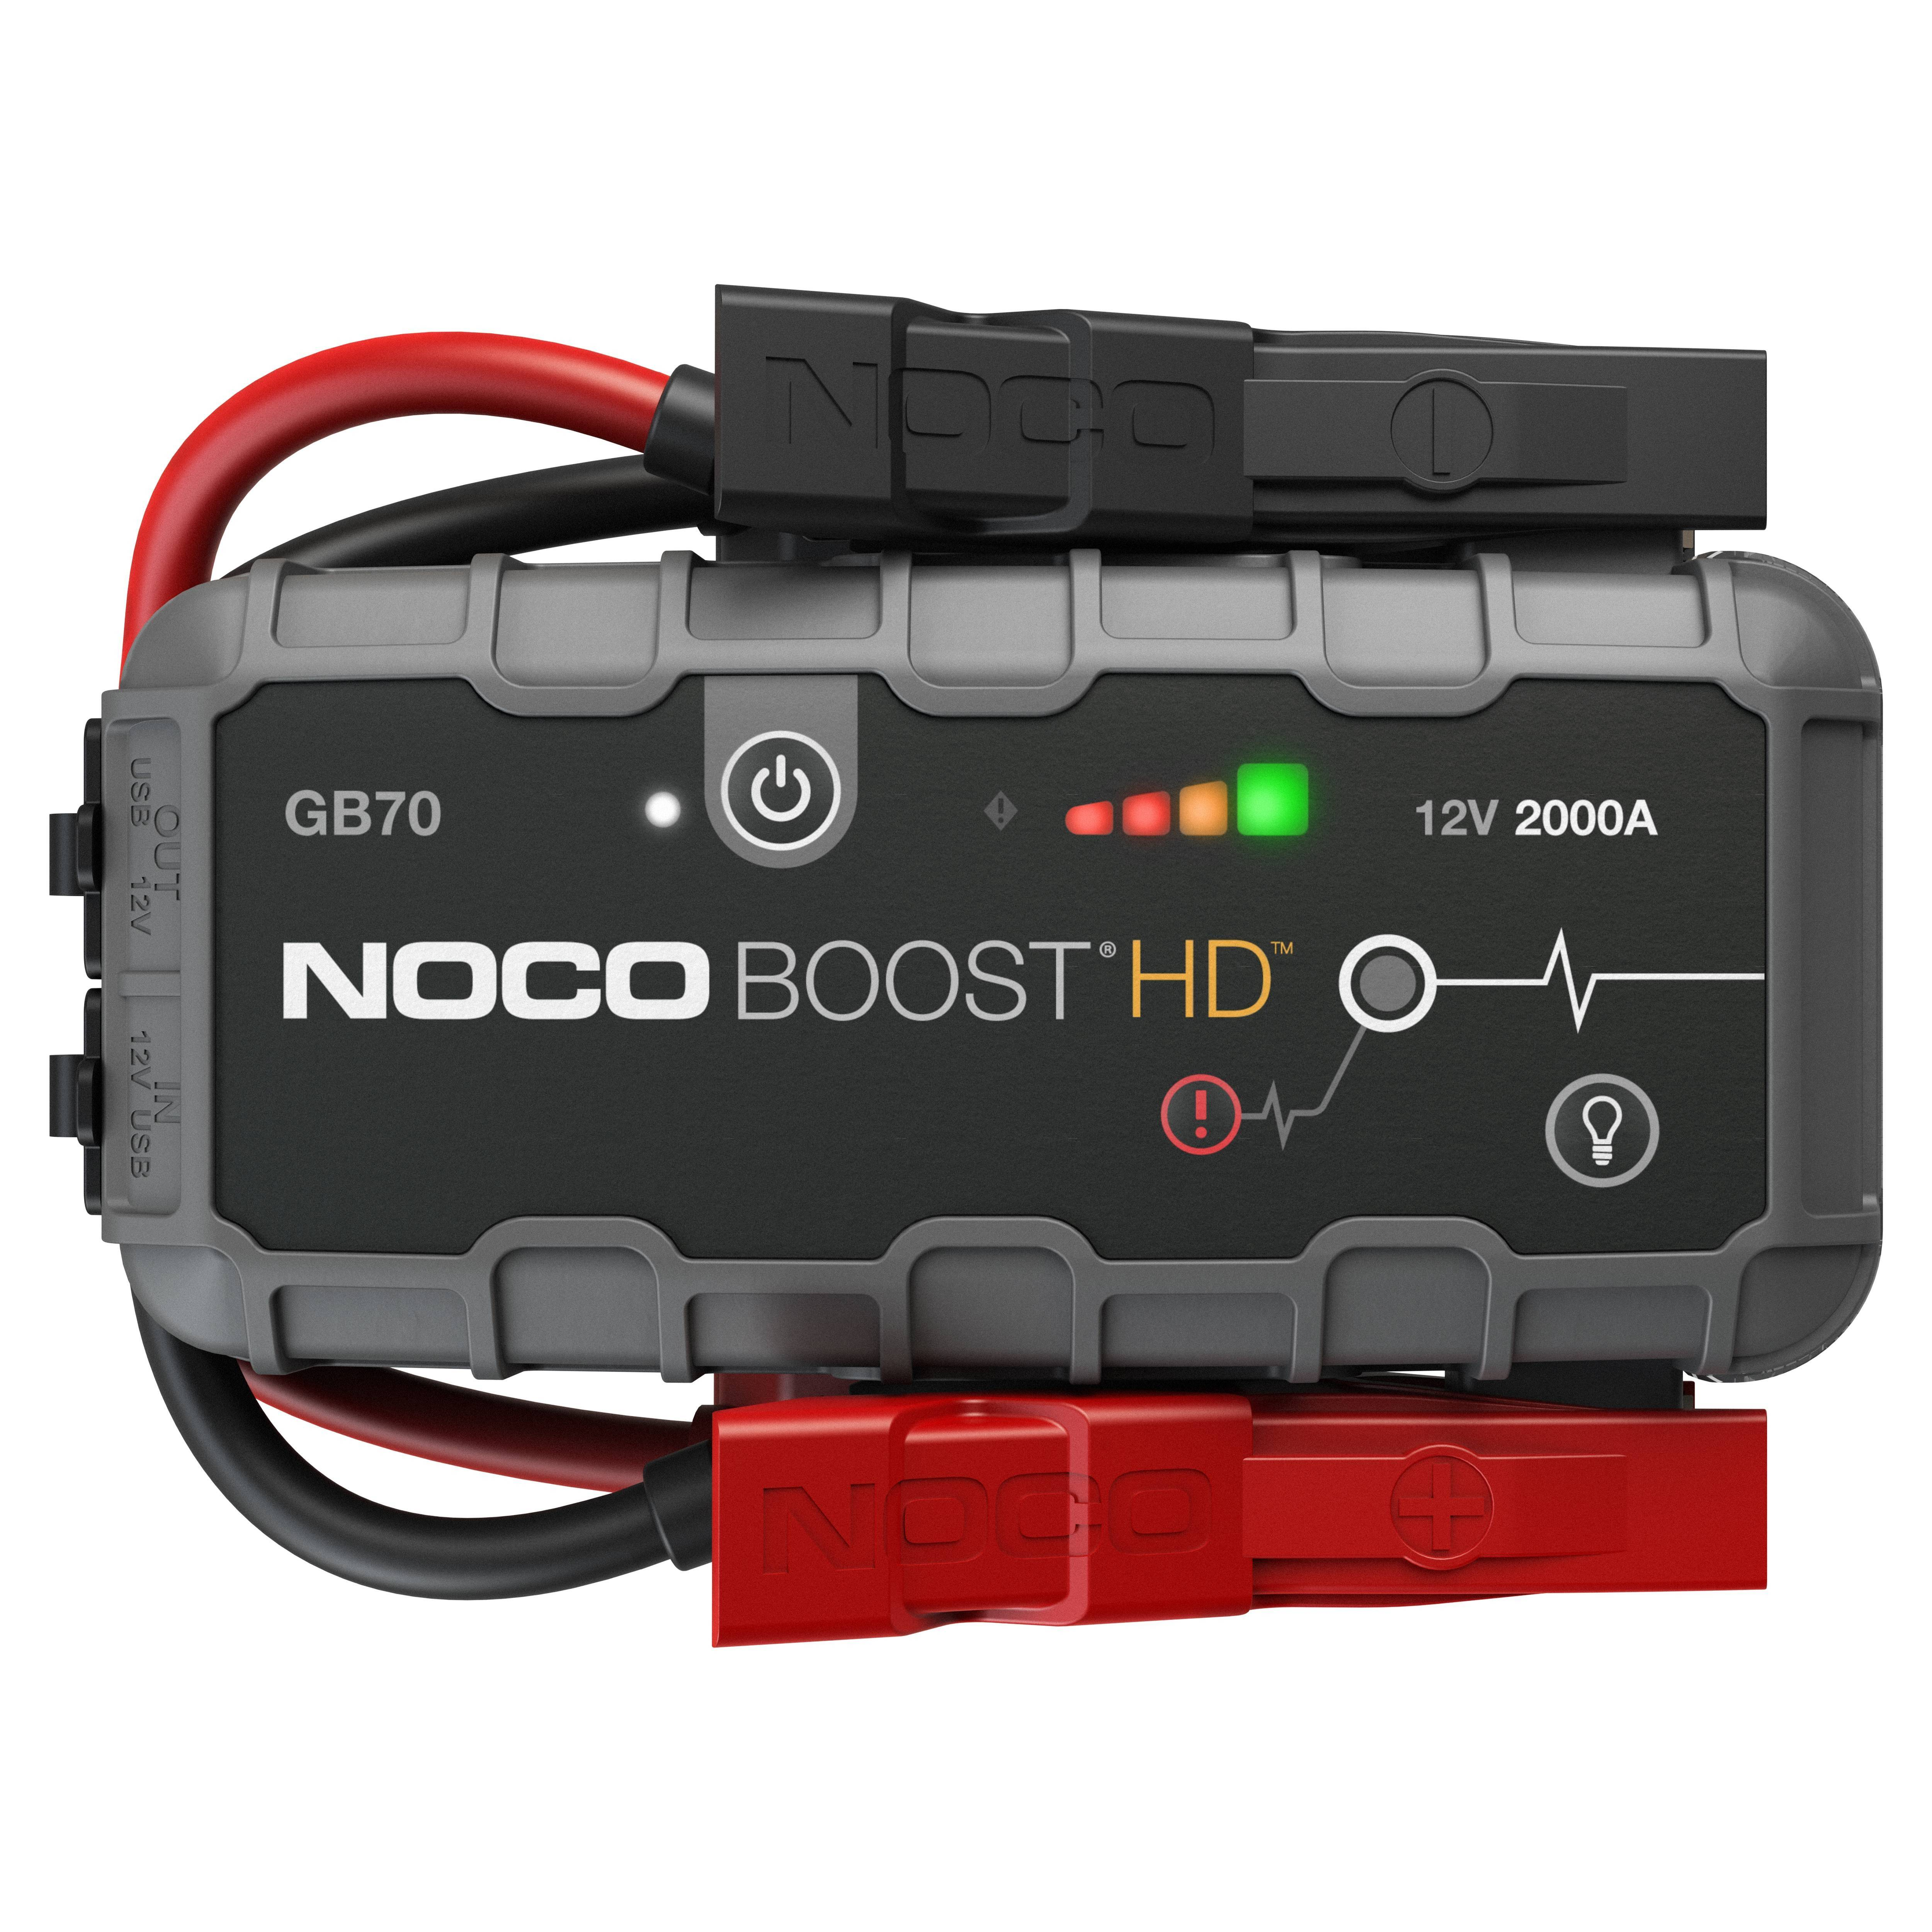 NOCO GB70 Boost 12V 2000A akkumulátor bikázó